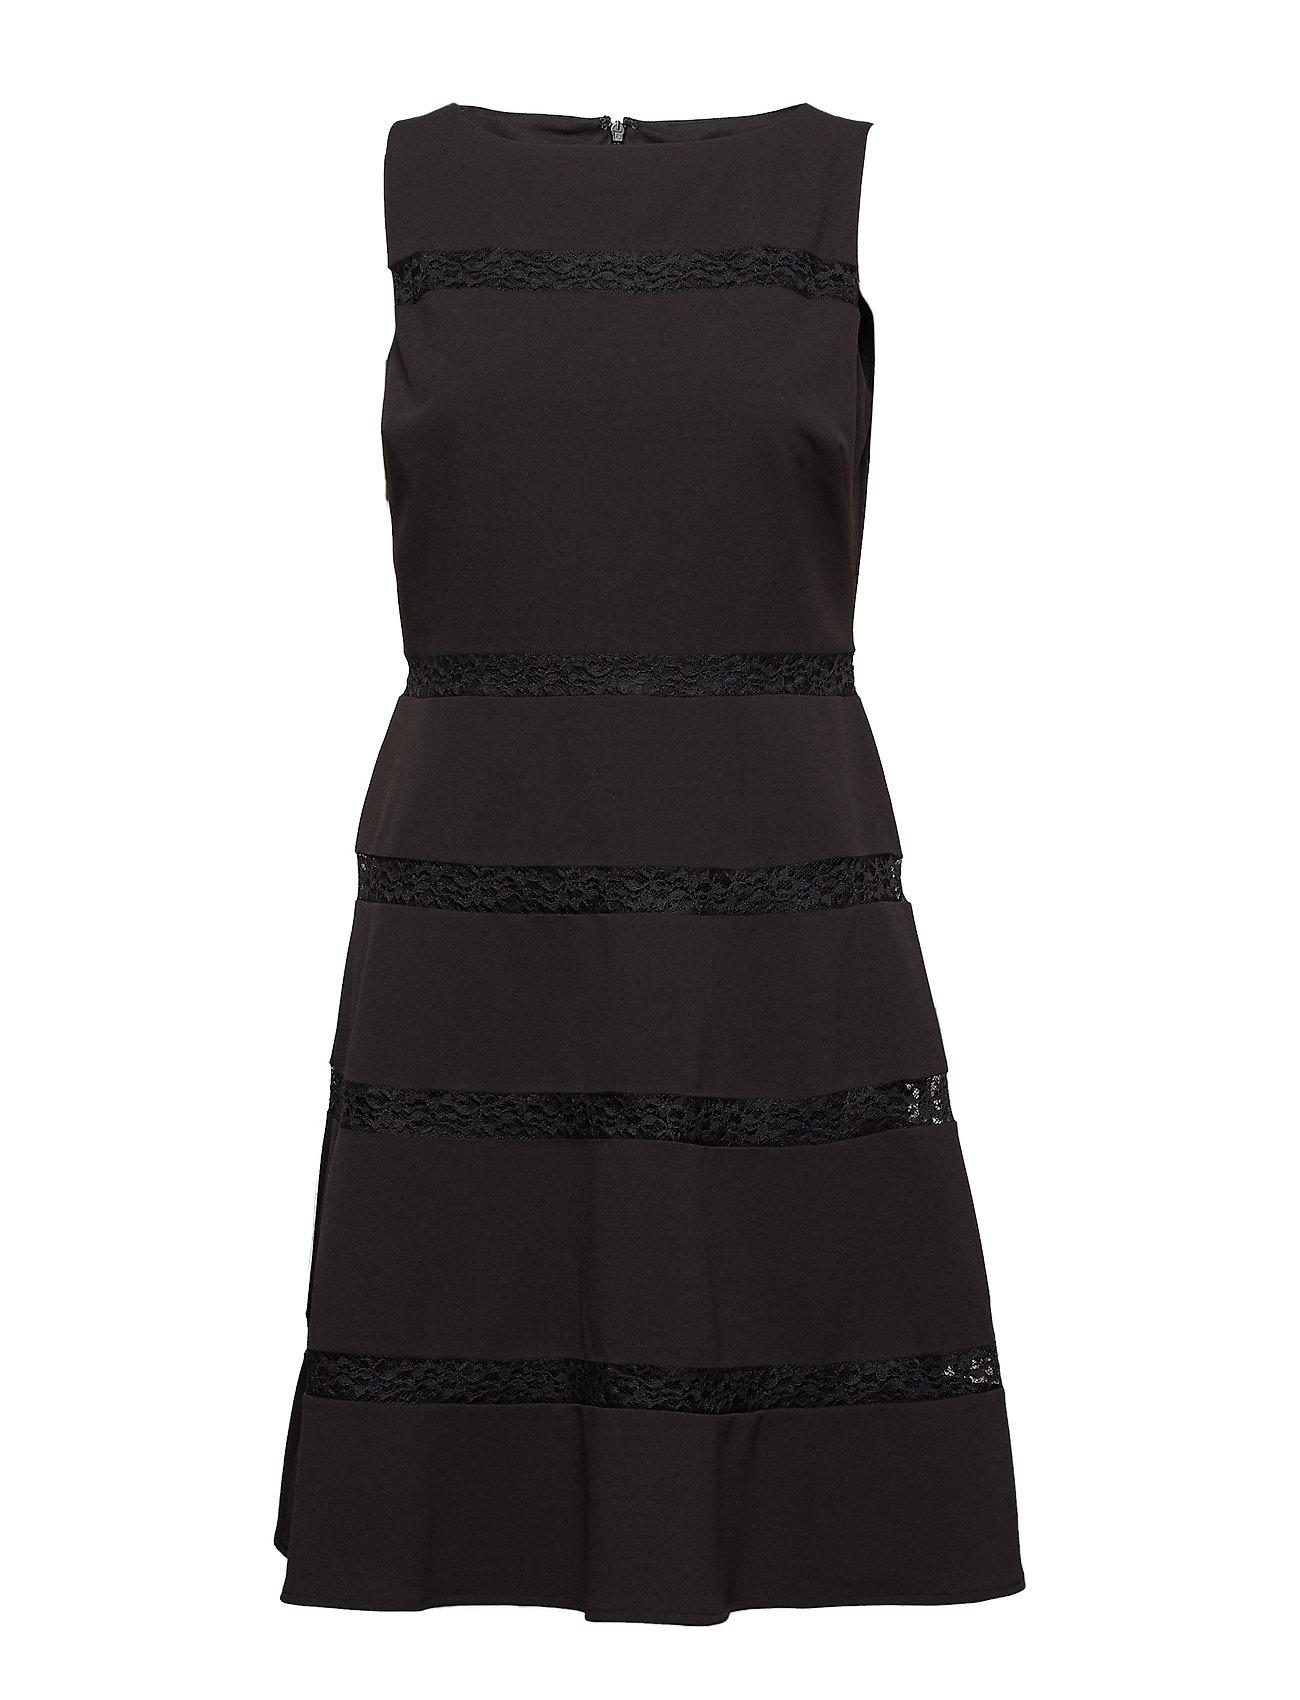 Lauren Ralph Lauren Lace-Trim Crepe Dress - BLACK